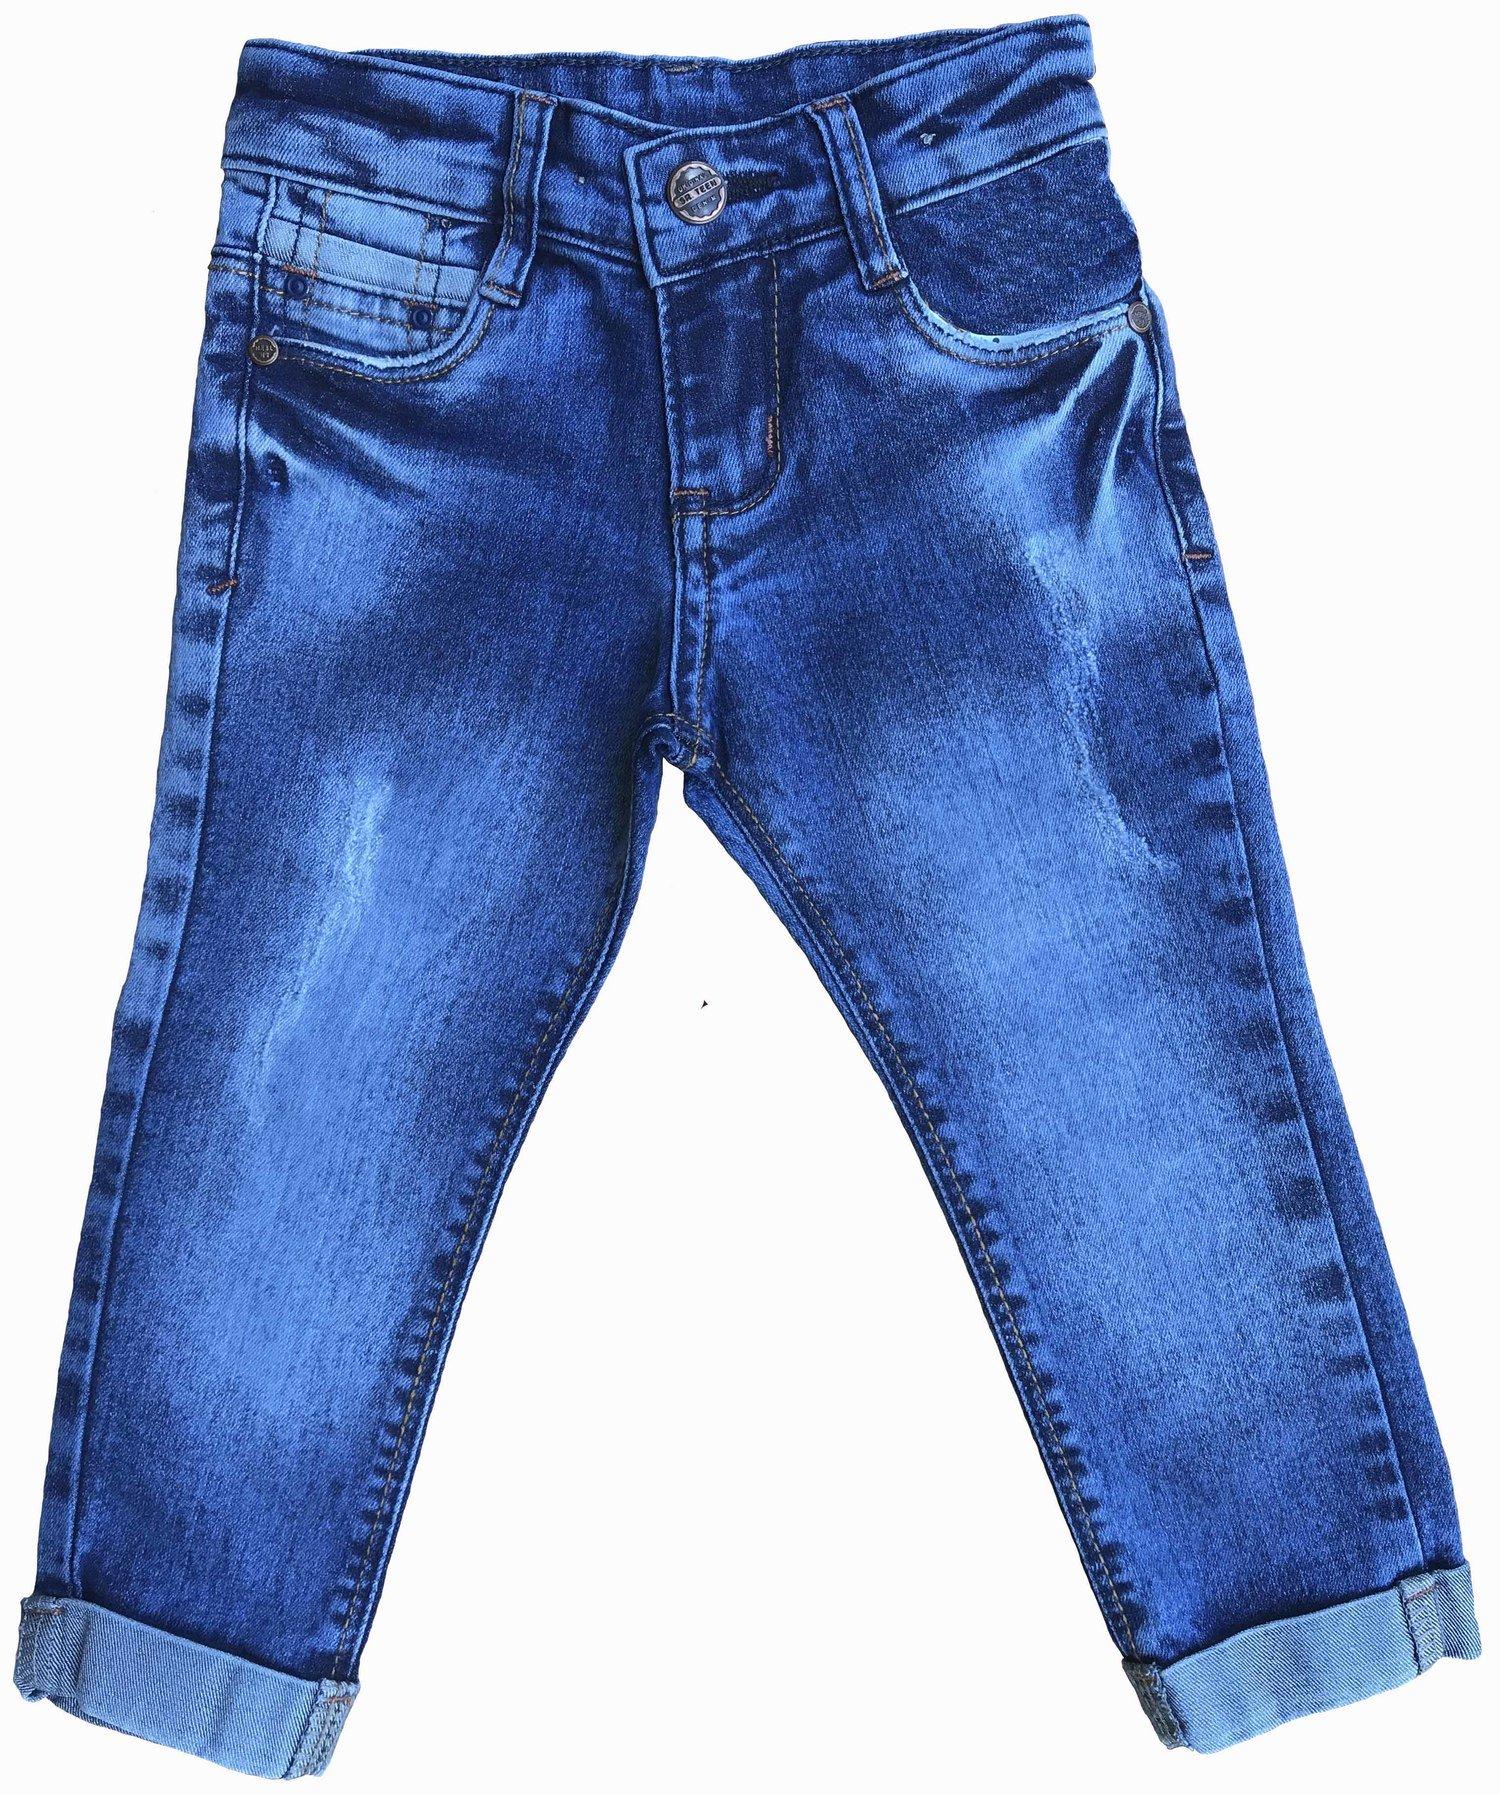 Calça Masculina Infantil Jeans [306-2]